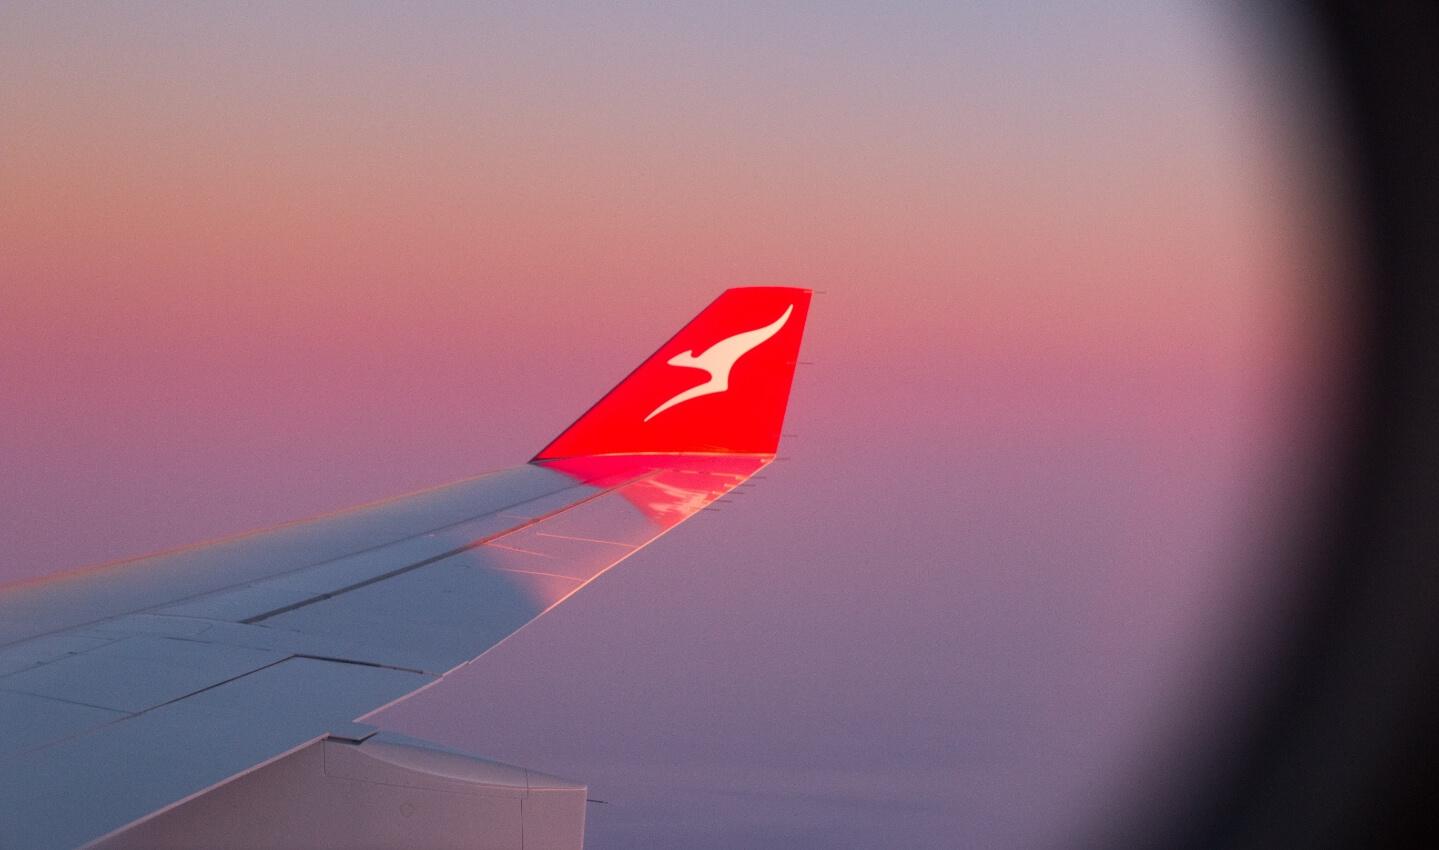 QantasLink Flights to Lord Howe Island